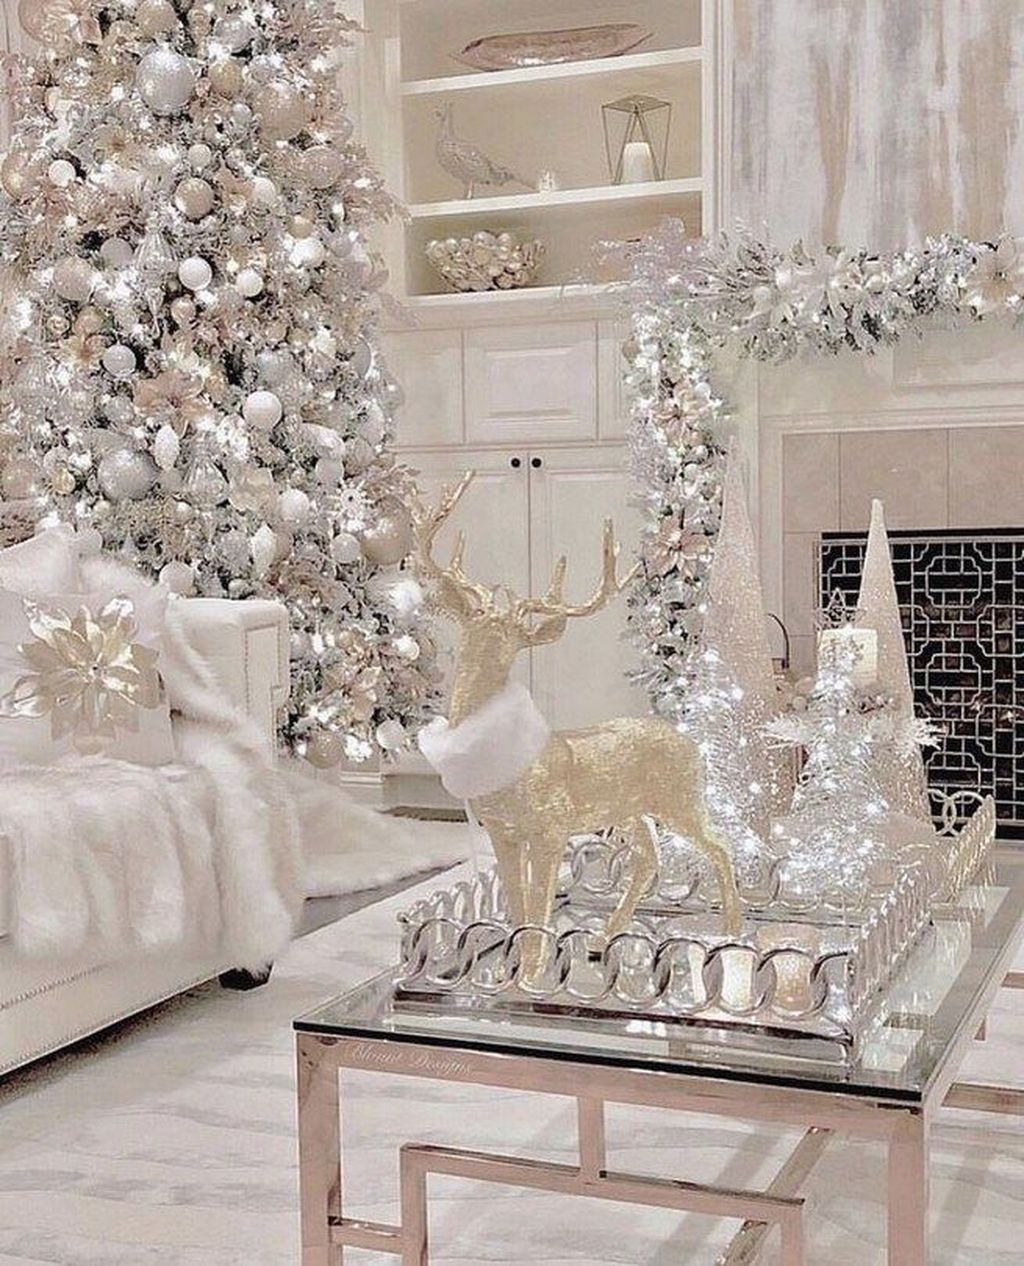 32 Amazing Winter Wonderland Home Decorations Ideas Elegant Christmas Decor White Christmas Trees Elegant Christmas